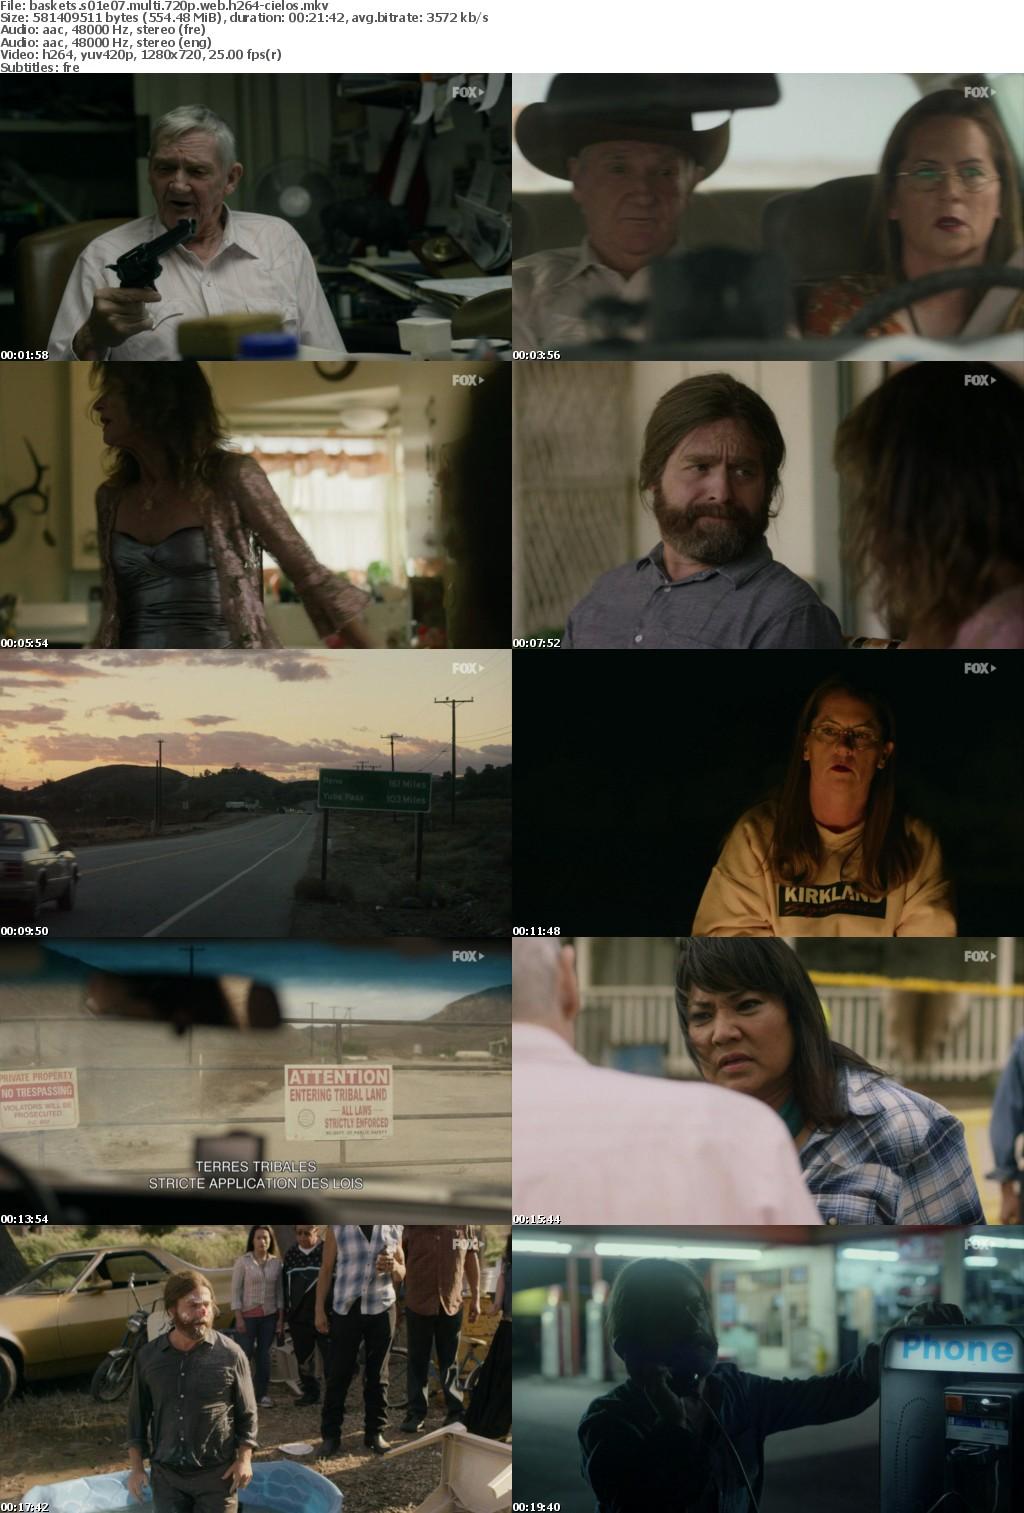 Baskets S01E07 MULTi 720p WEB H264-CiELOS